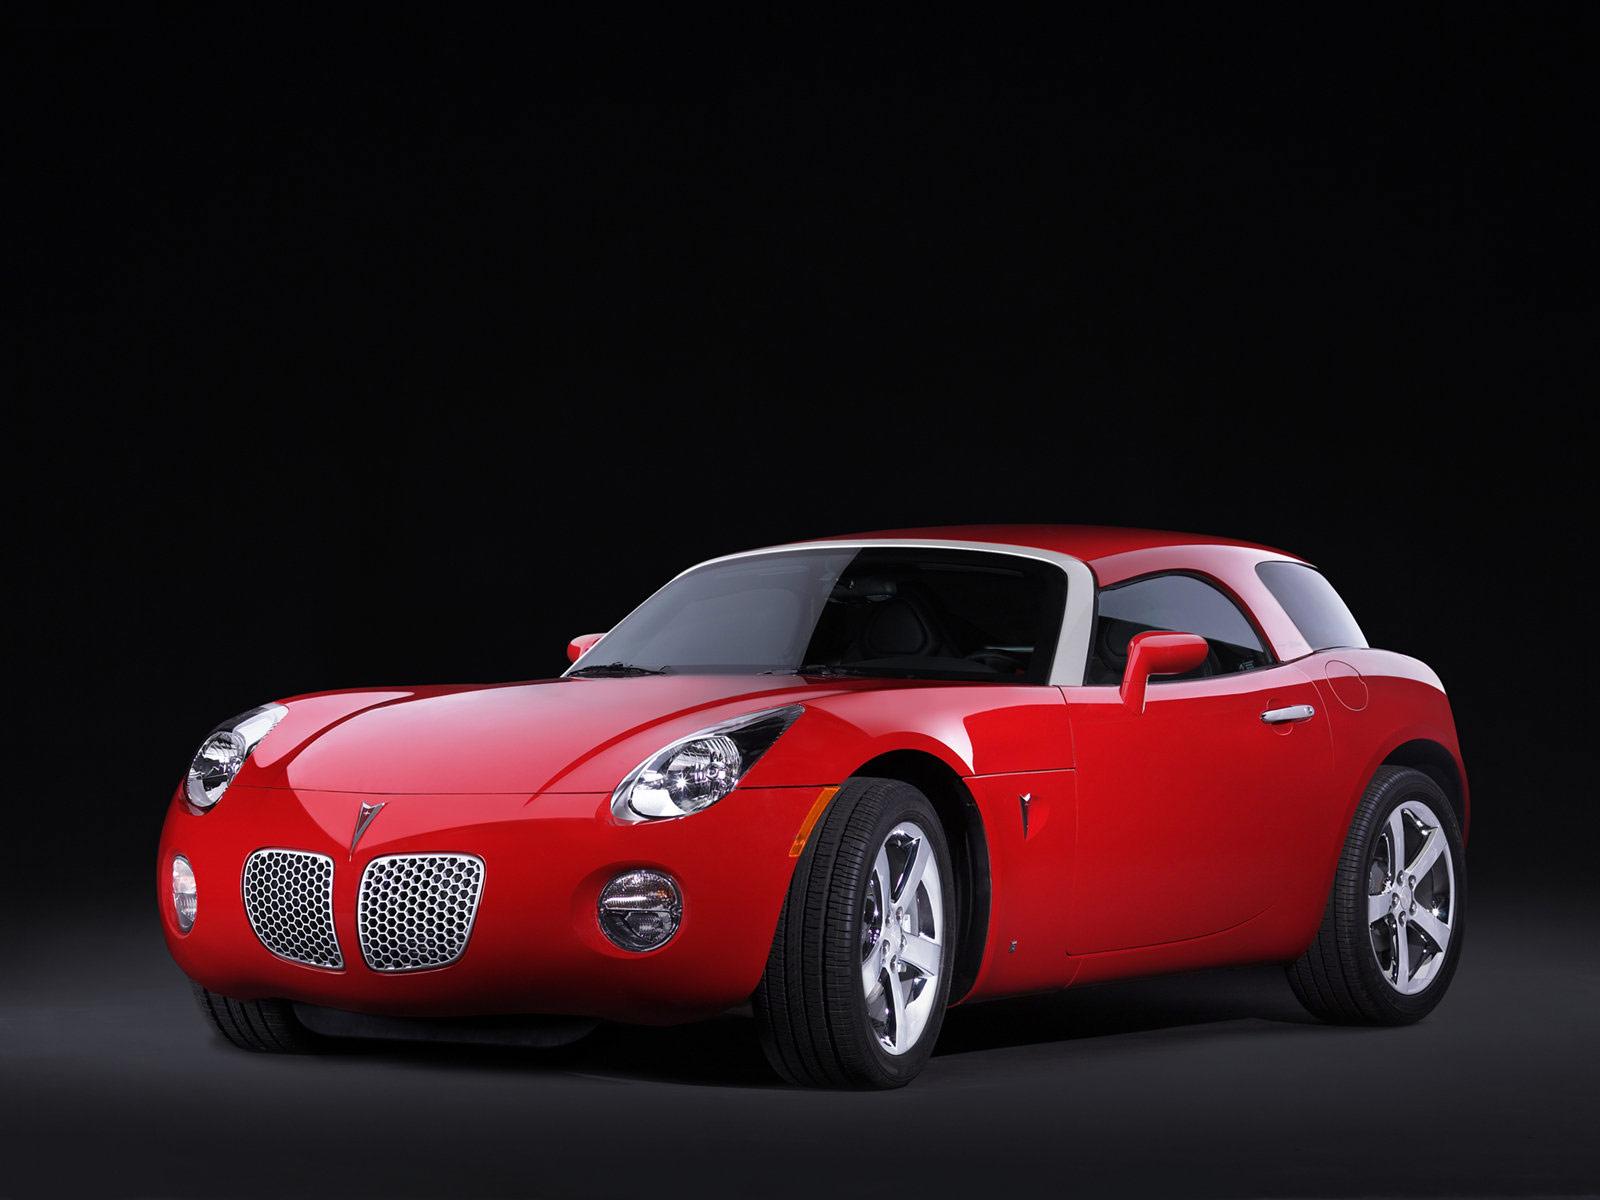 Edag Pontiac Solstice Hard Top Concept 2006